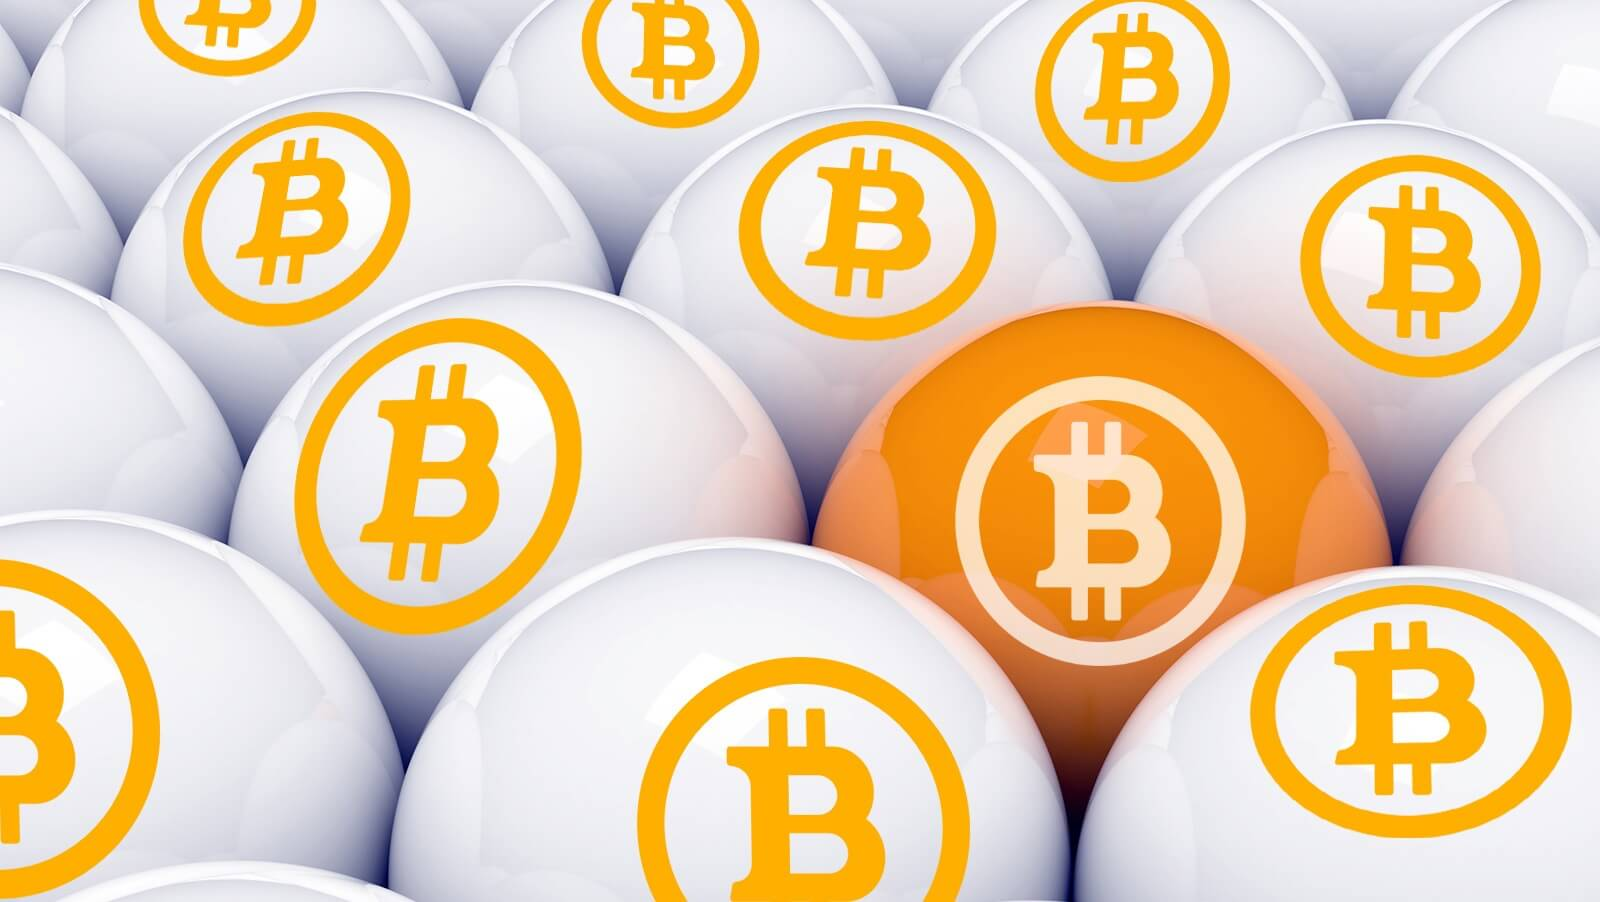 anonymously buy bitcoins uk lottery